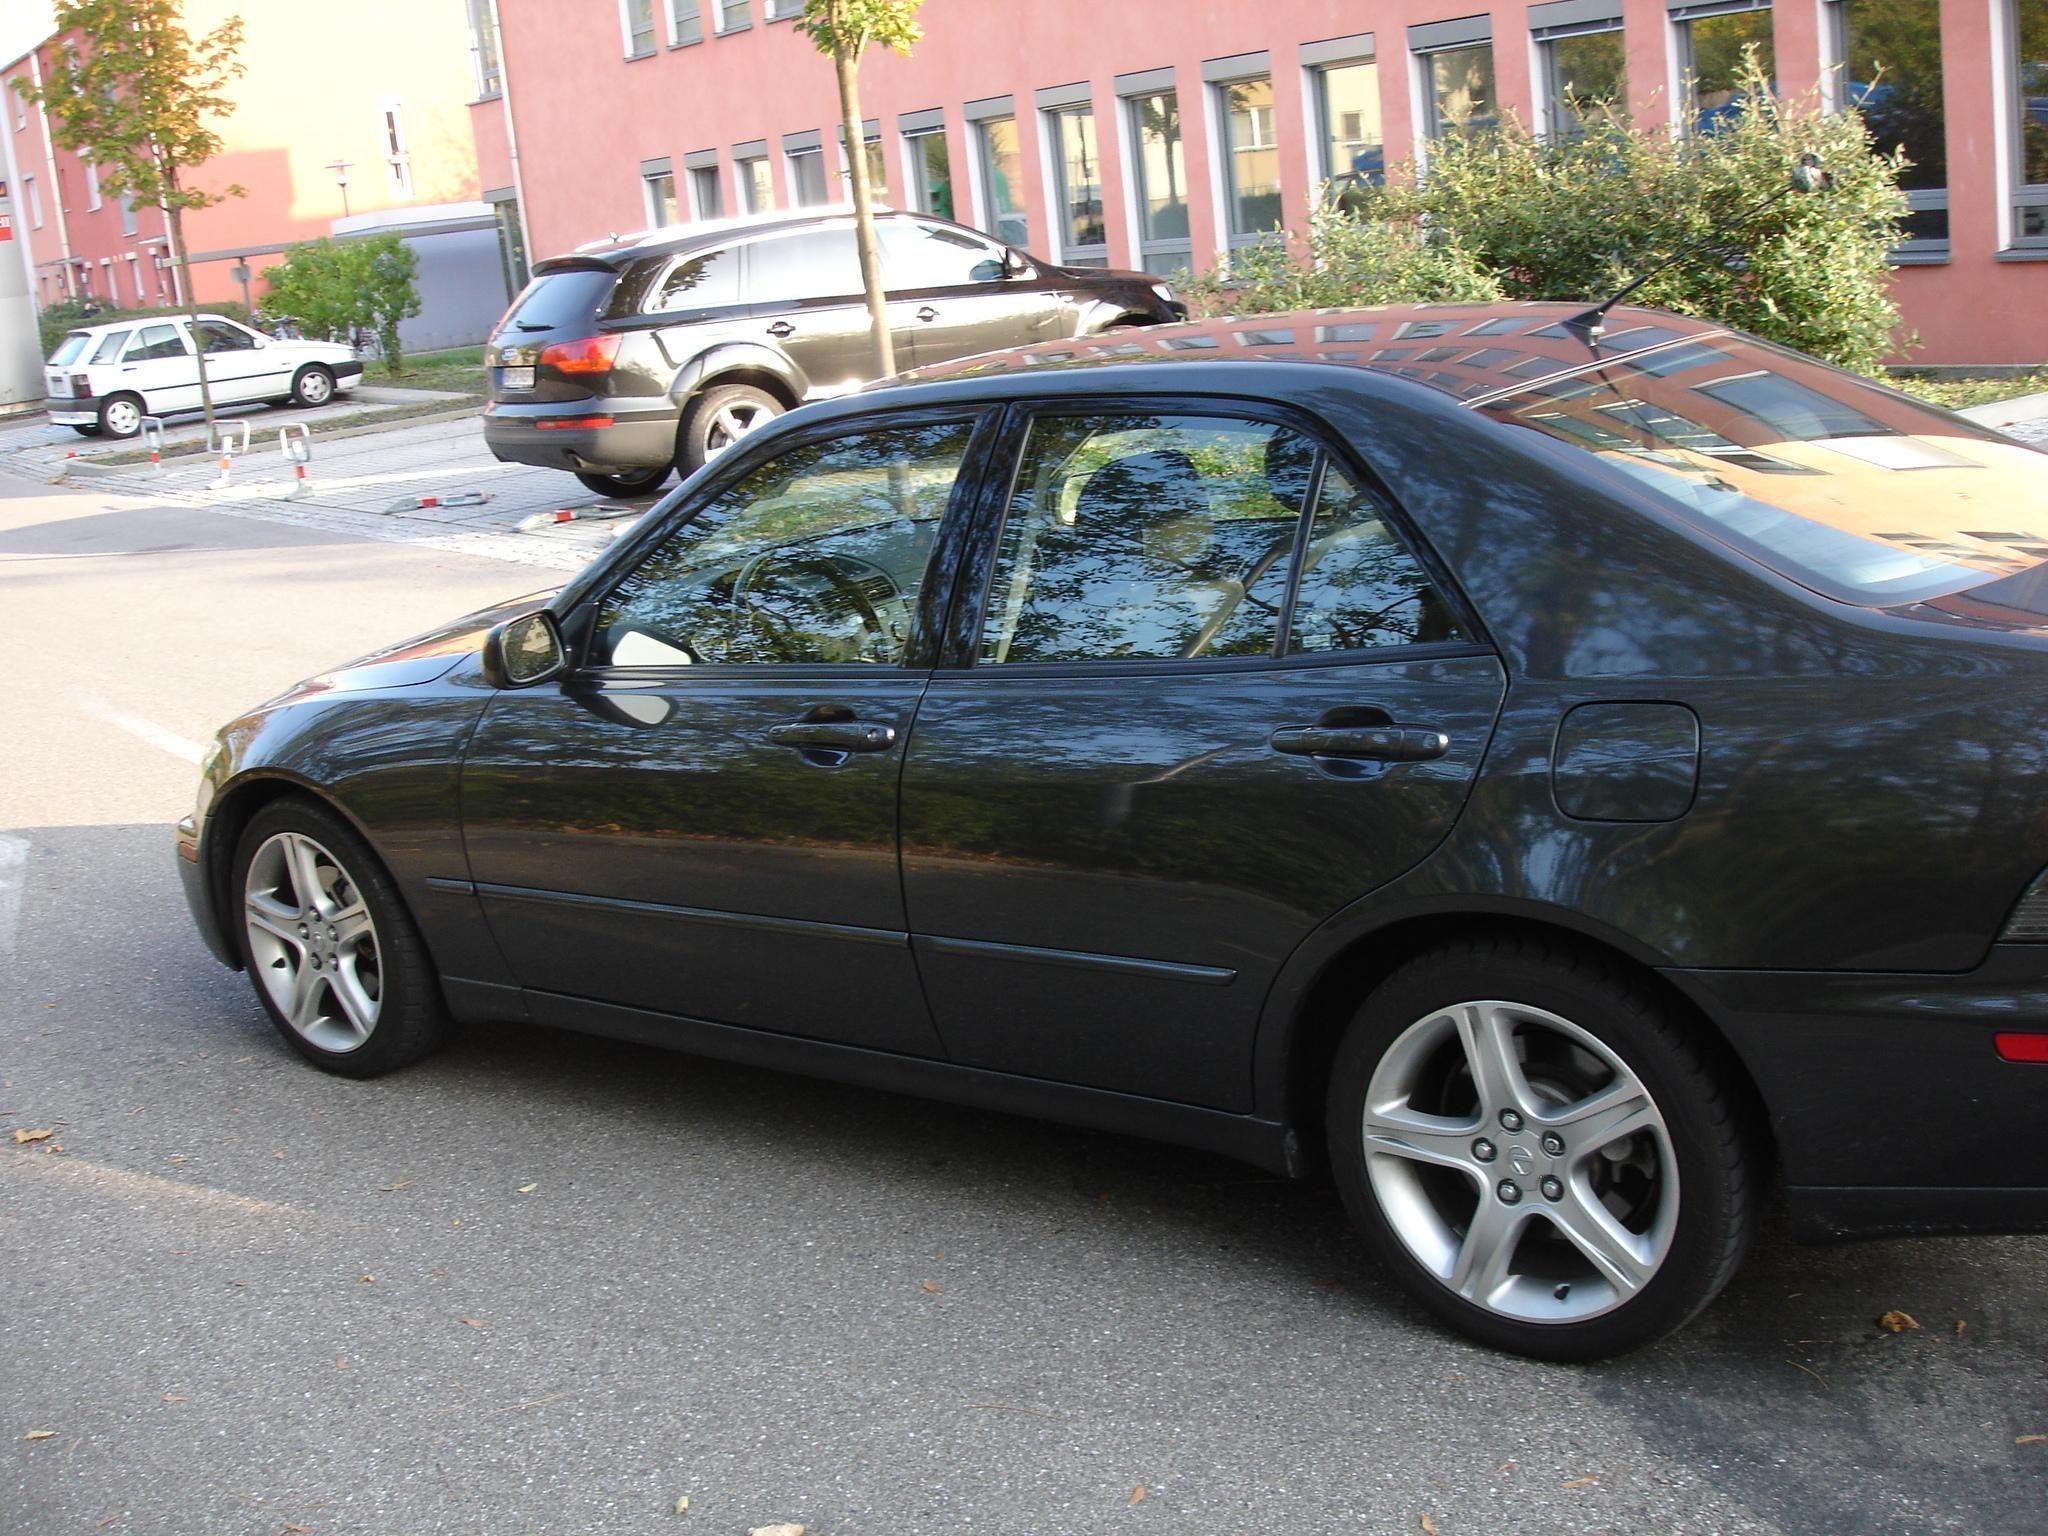 Lexus IS300 side-shot #lexus #IS300 #japanese #jdm #lexusis300 Lexus IS300 side-shot #lexus #IS300 #japanese #jdm #lexusis300 Lexus IS300 side-shot #lexus #IS300 #japanese #jdm #lexusis300 Lexus IS300 side-shot #lexus #IS300 #japanese #jdm #lexusis300 Lexus IS300 side-shot #lexus #IS300 #japanese #jdm #lexusis300 Lexus IS300 side-shot #lexus #IS300 #japanese #jdm #lexusis300 Lexus IS300 side-shot #lexus #IS300 #japanese #jdm #lexusis300 Lexus IS300 side-shot #lexus #IS300 #japanese #jdm #lexusis #lexusis300